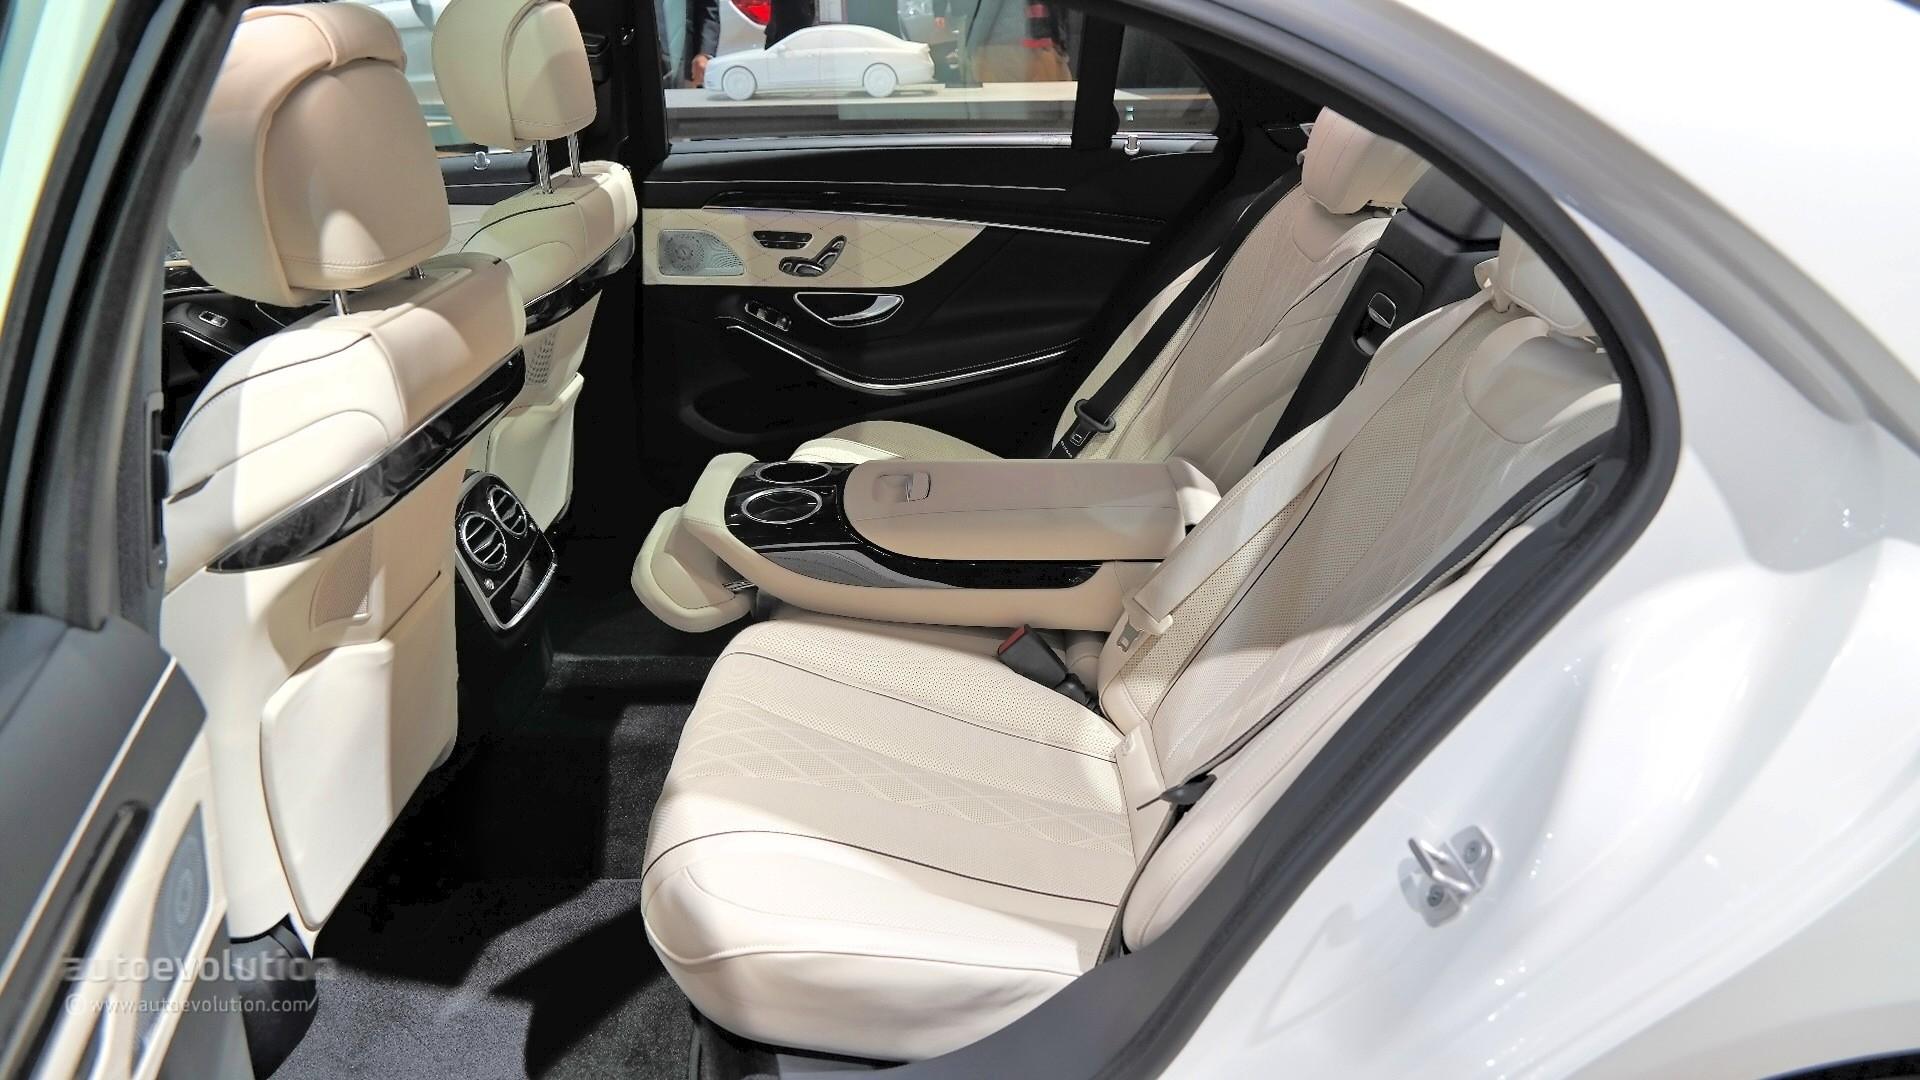 https://www.benzinsider.com/wp-content/uploads/2015/01/2015-Mercedes-Benz-S550-Plug-In-Hybrid-28.jpg